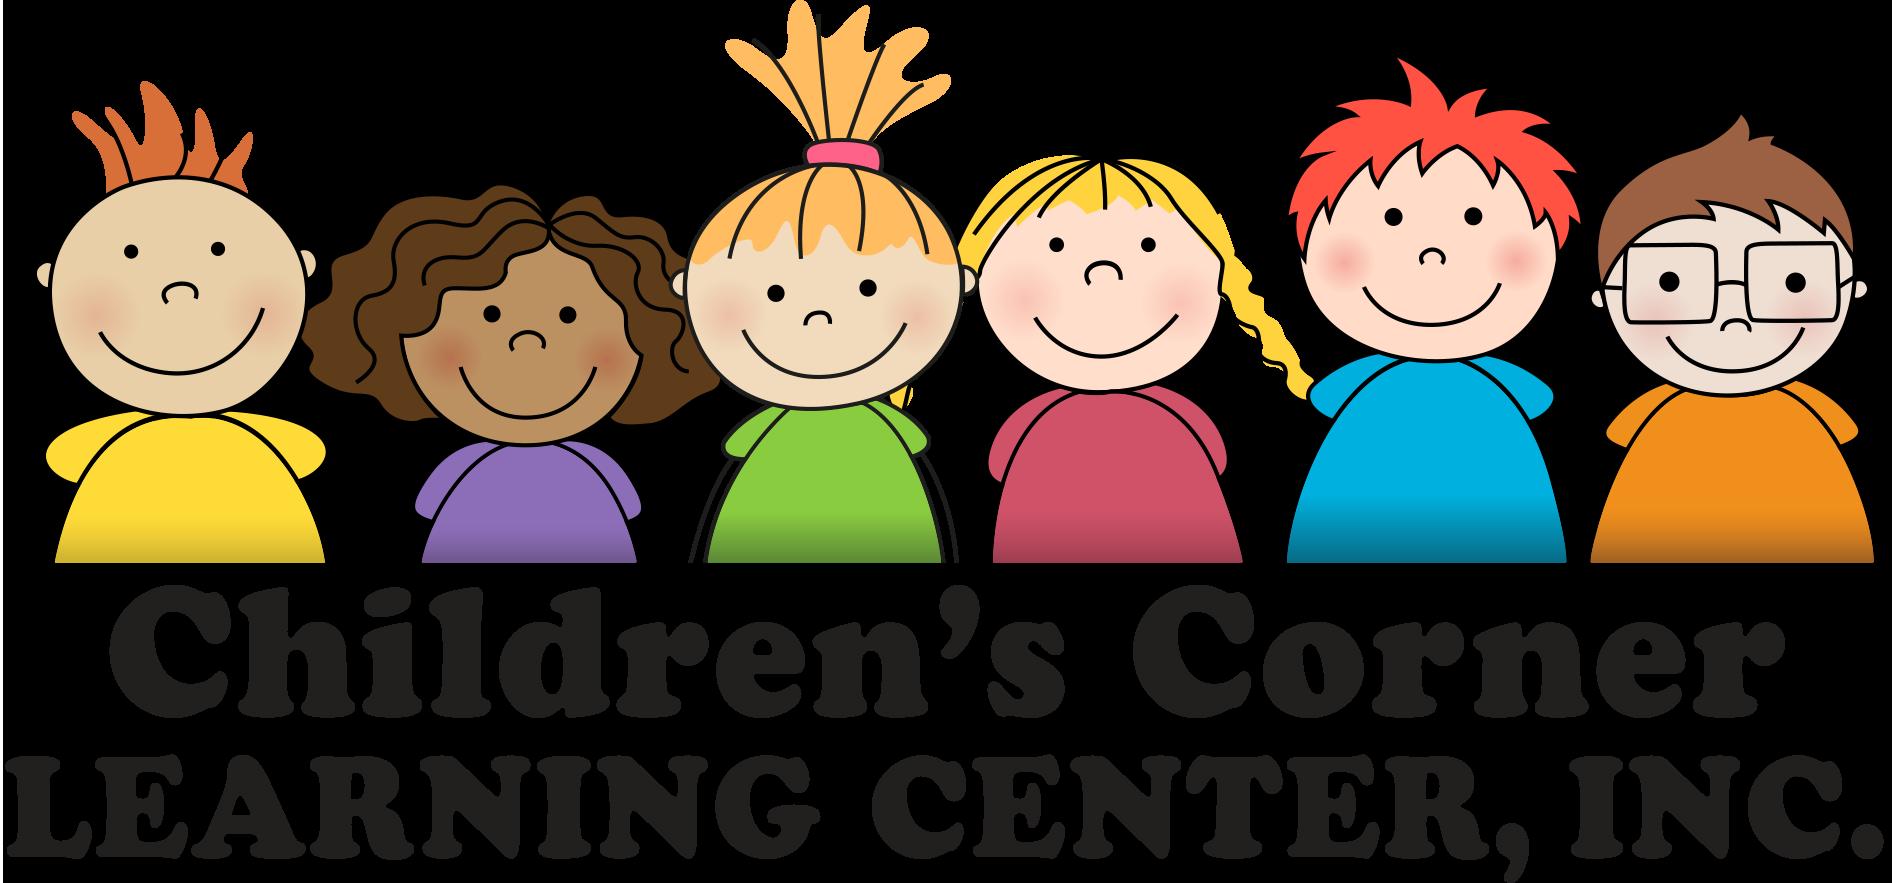 image free Childrens corner learning center. Learn clipart kids.